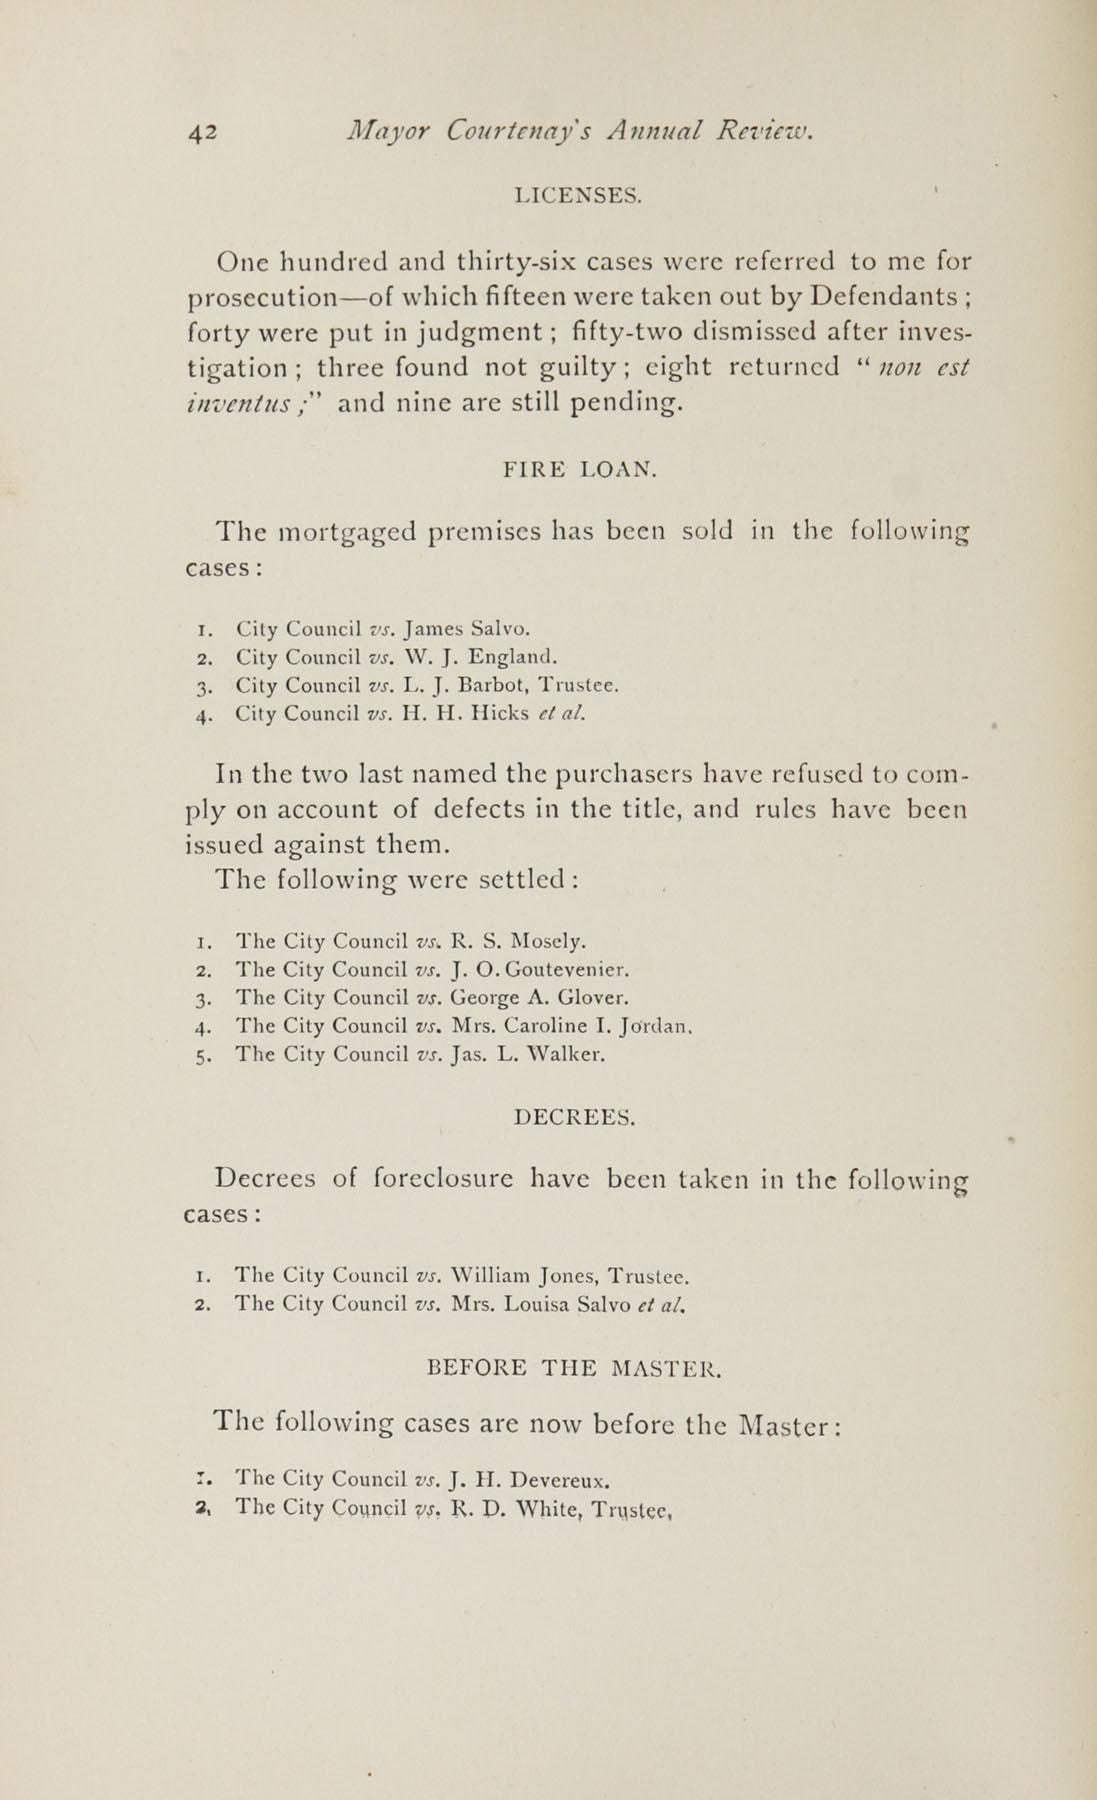 Charleston Yearbook, 1882, page 42